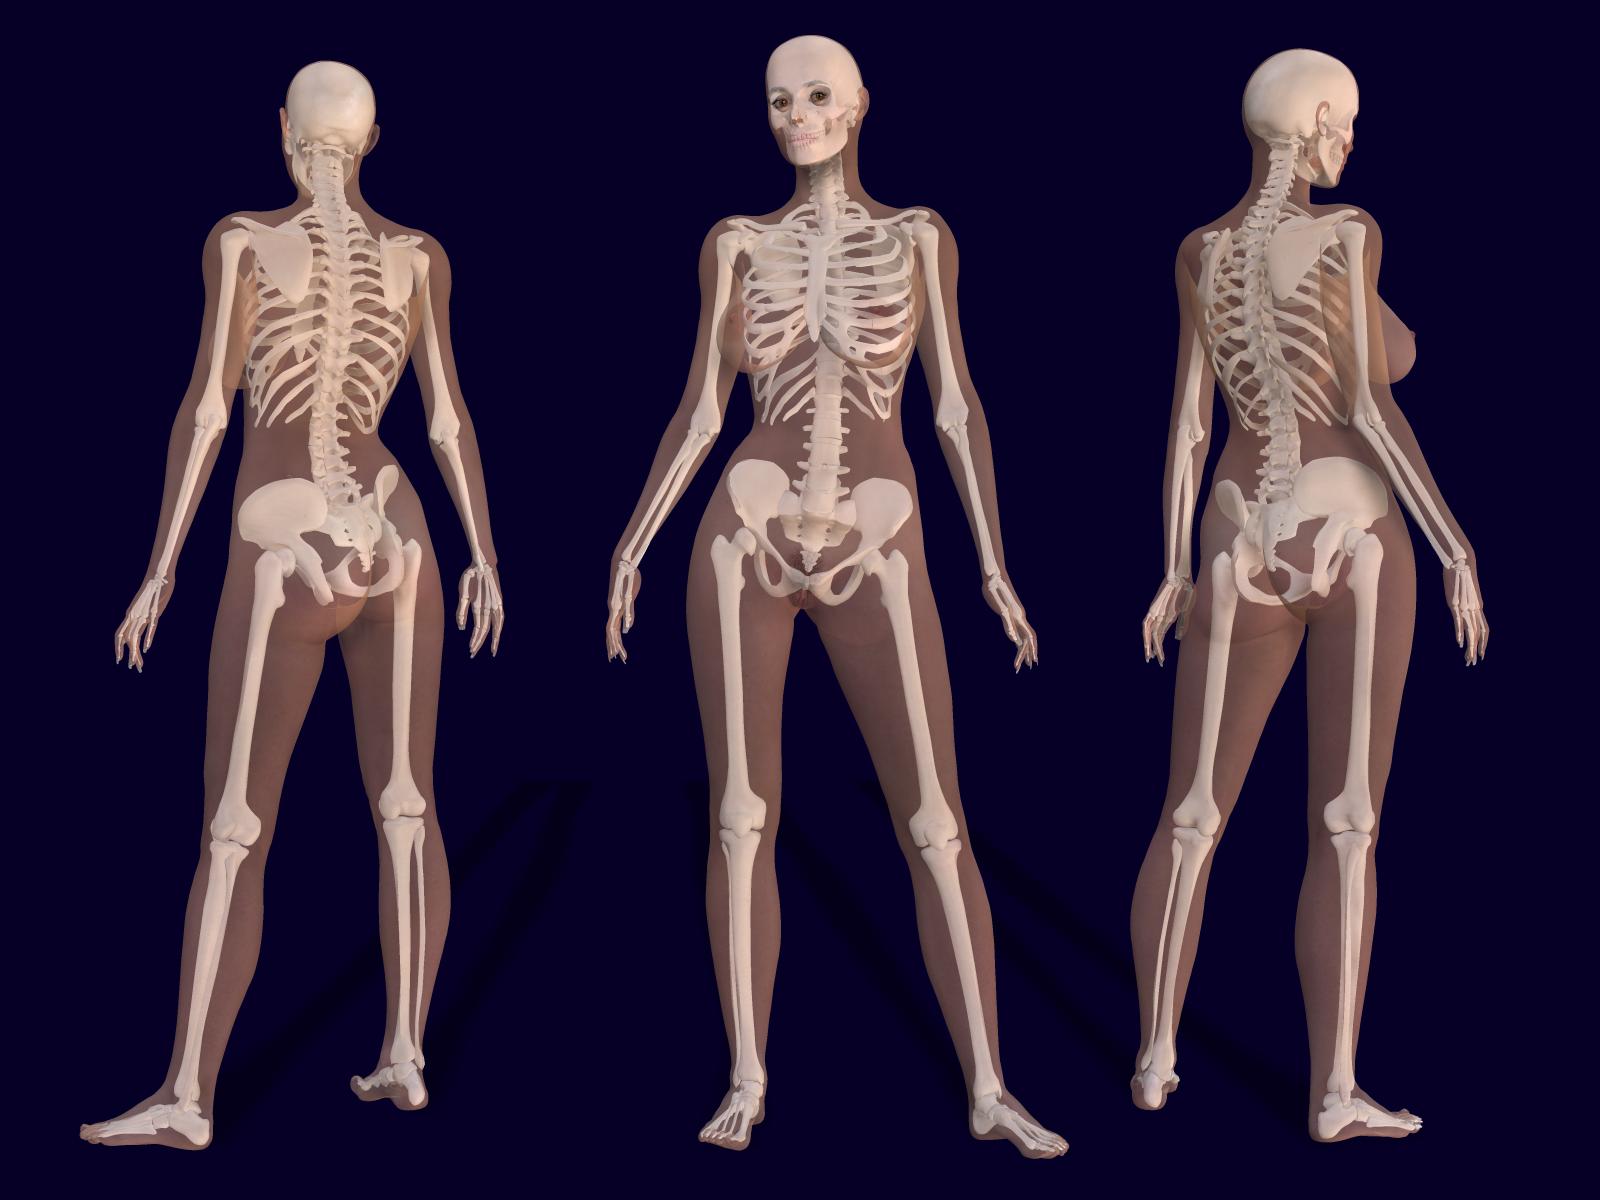 3D_Female_Skeleton_Anatomy.png